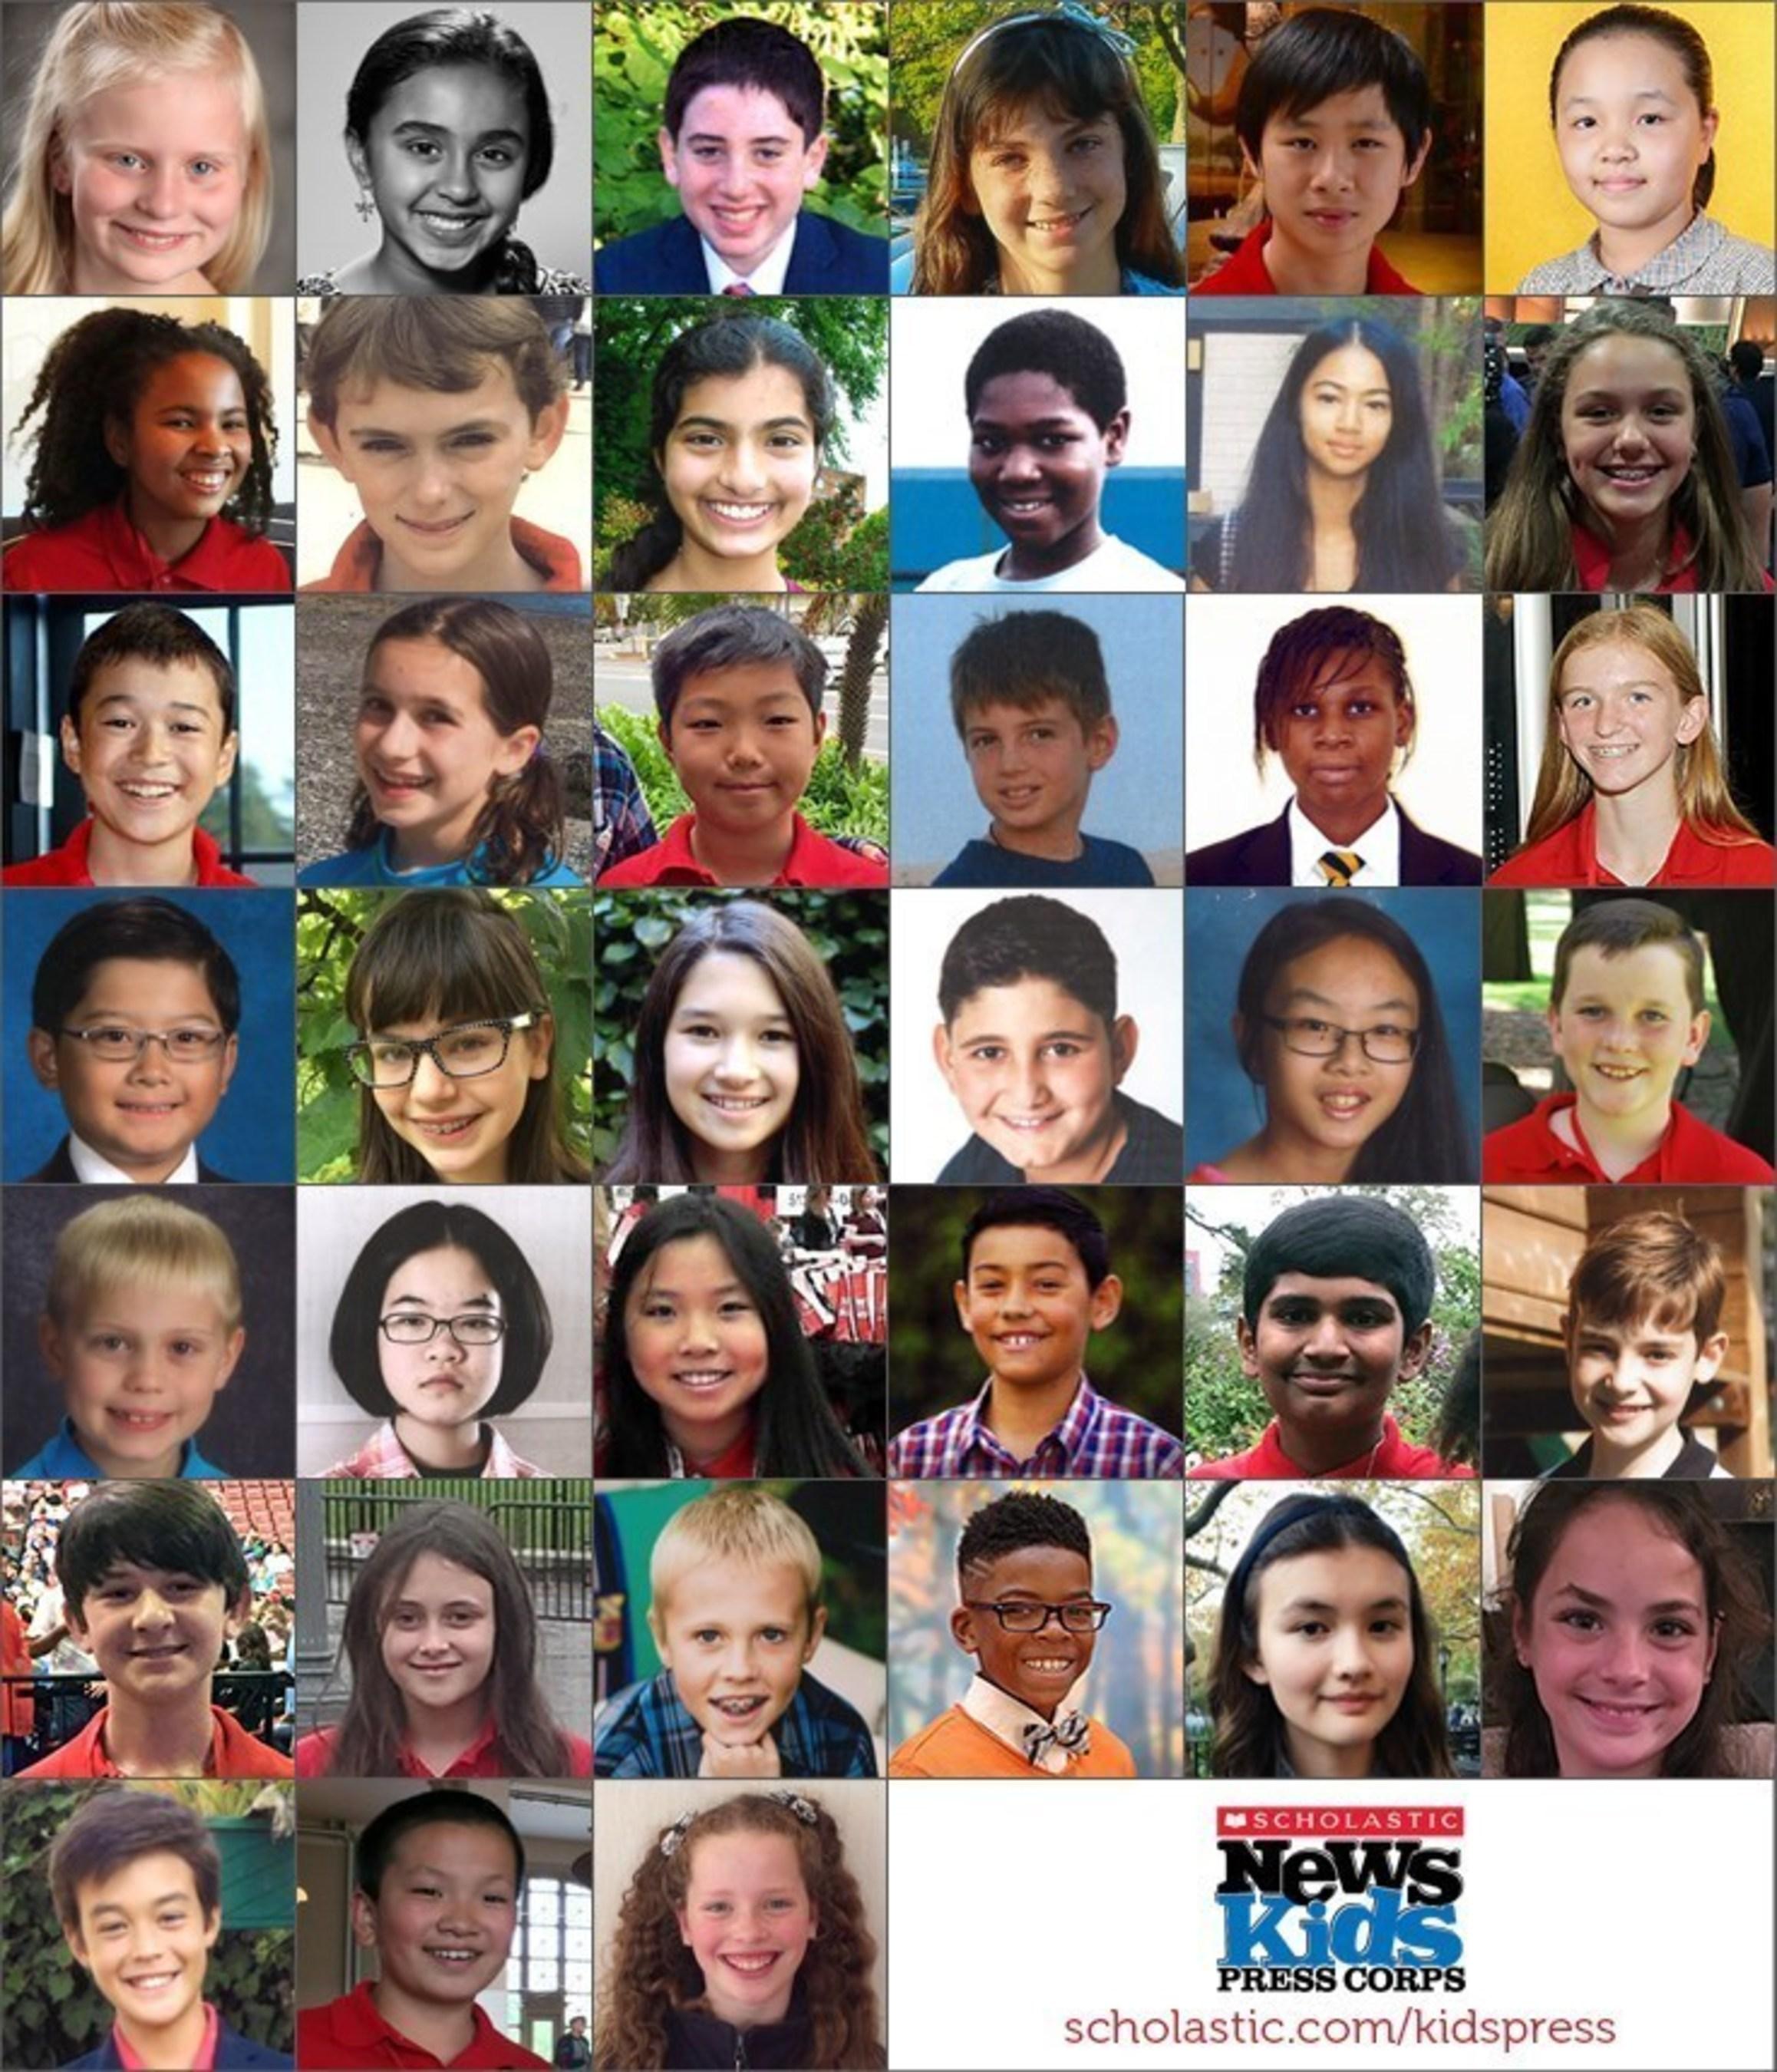 Scholastic Announces 39 Kid Reporters Chosen for 2016-17 Scholastic News Kids Press Corps